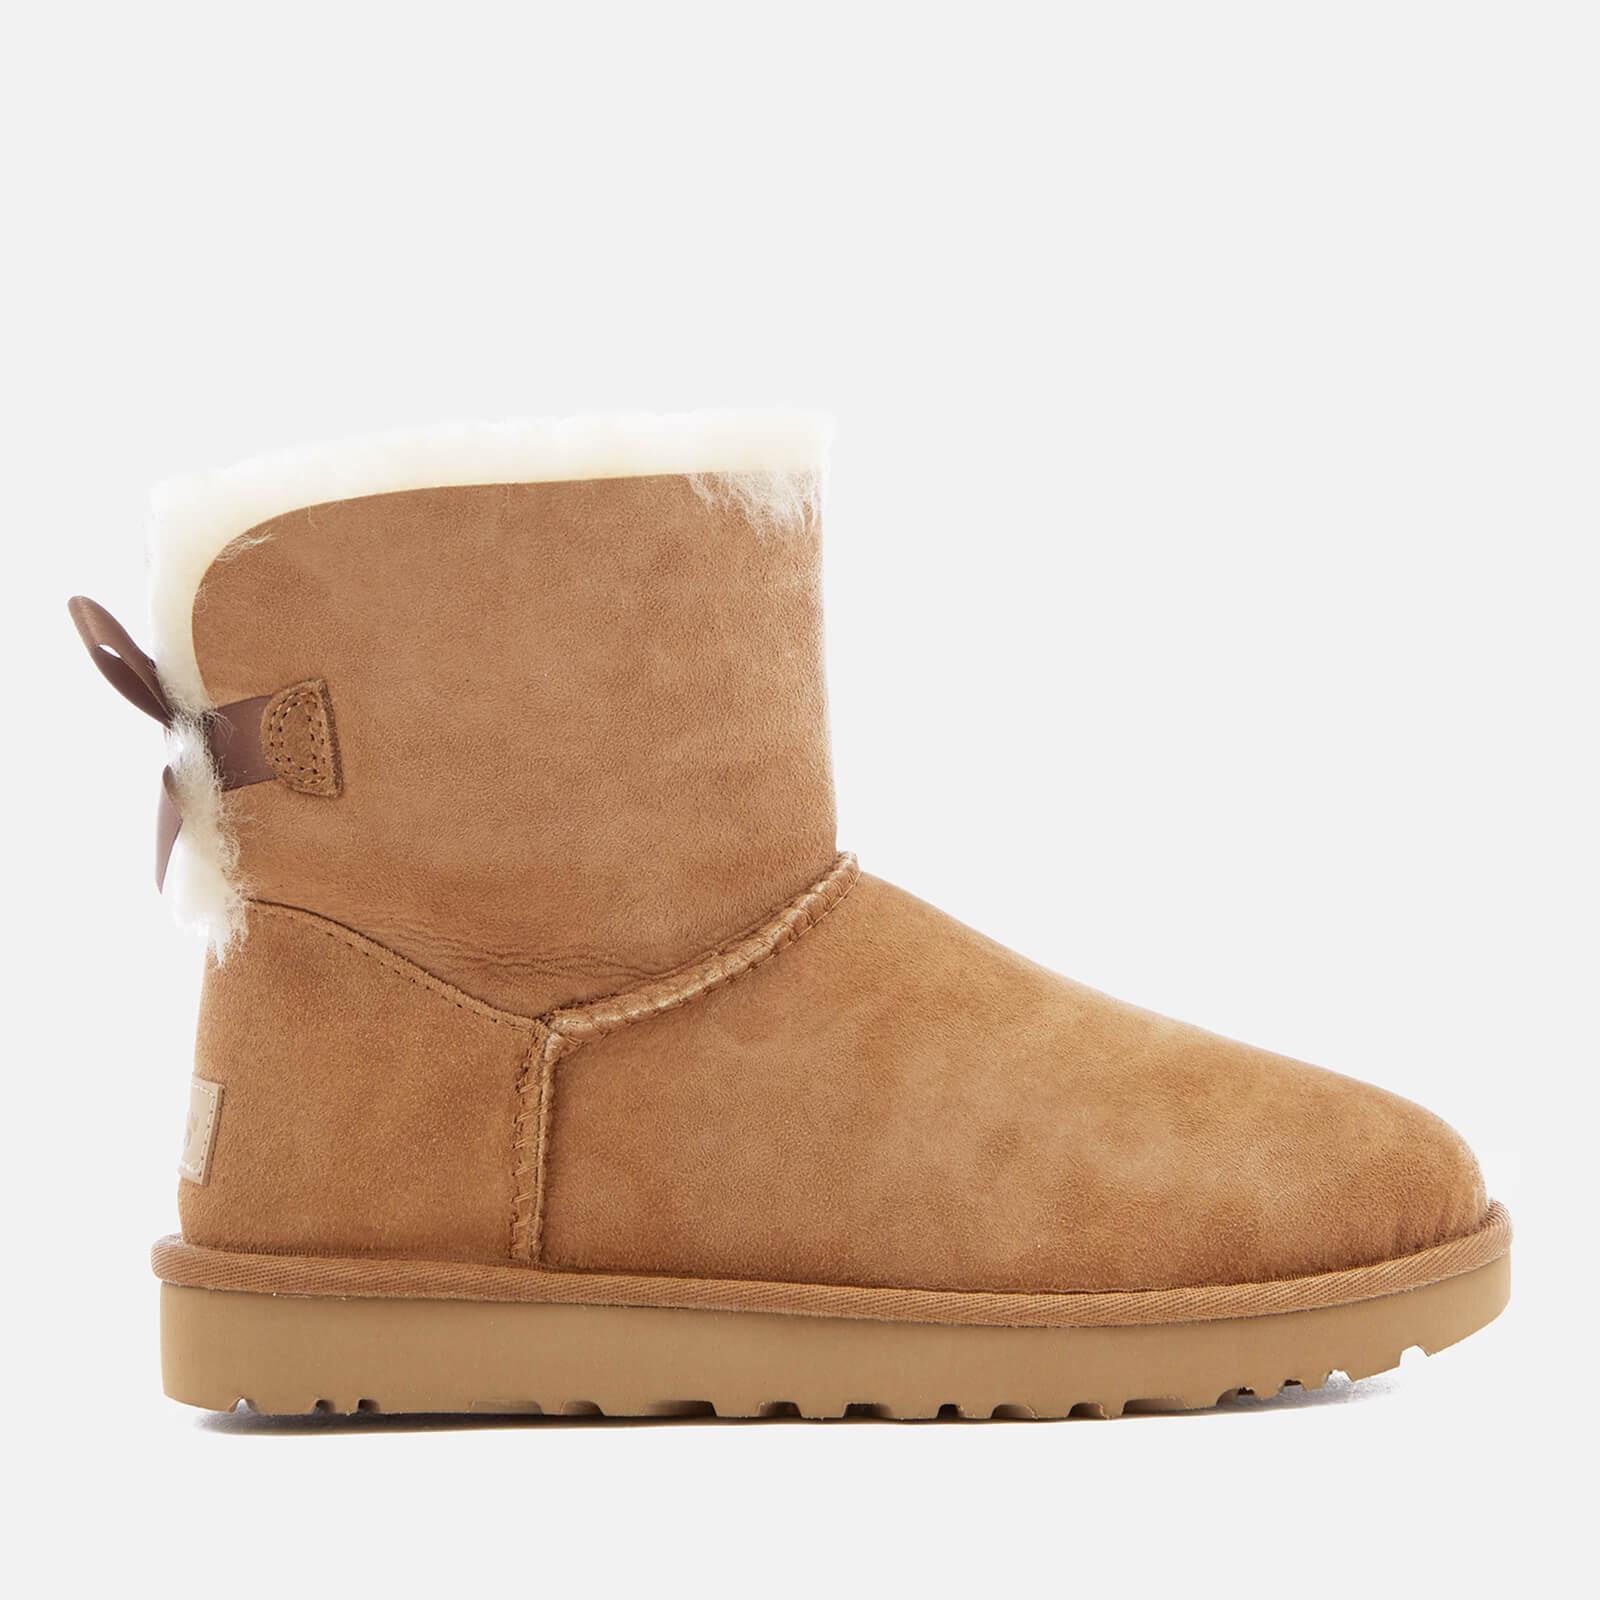 UGG Women's Mini Bailey Bow II Sheepskin Boots - Chestnut - UK 8